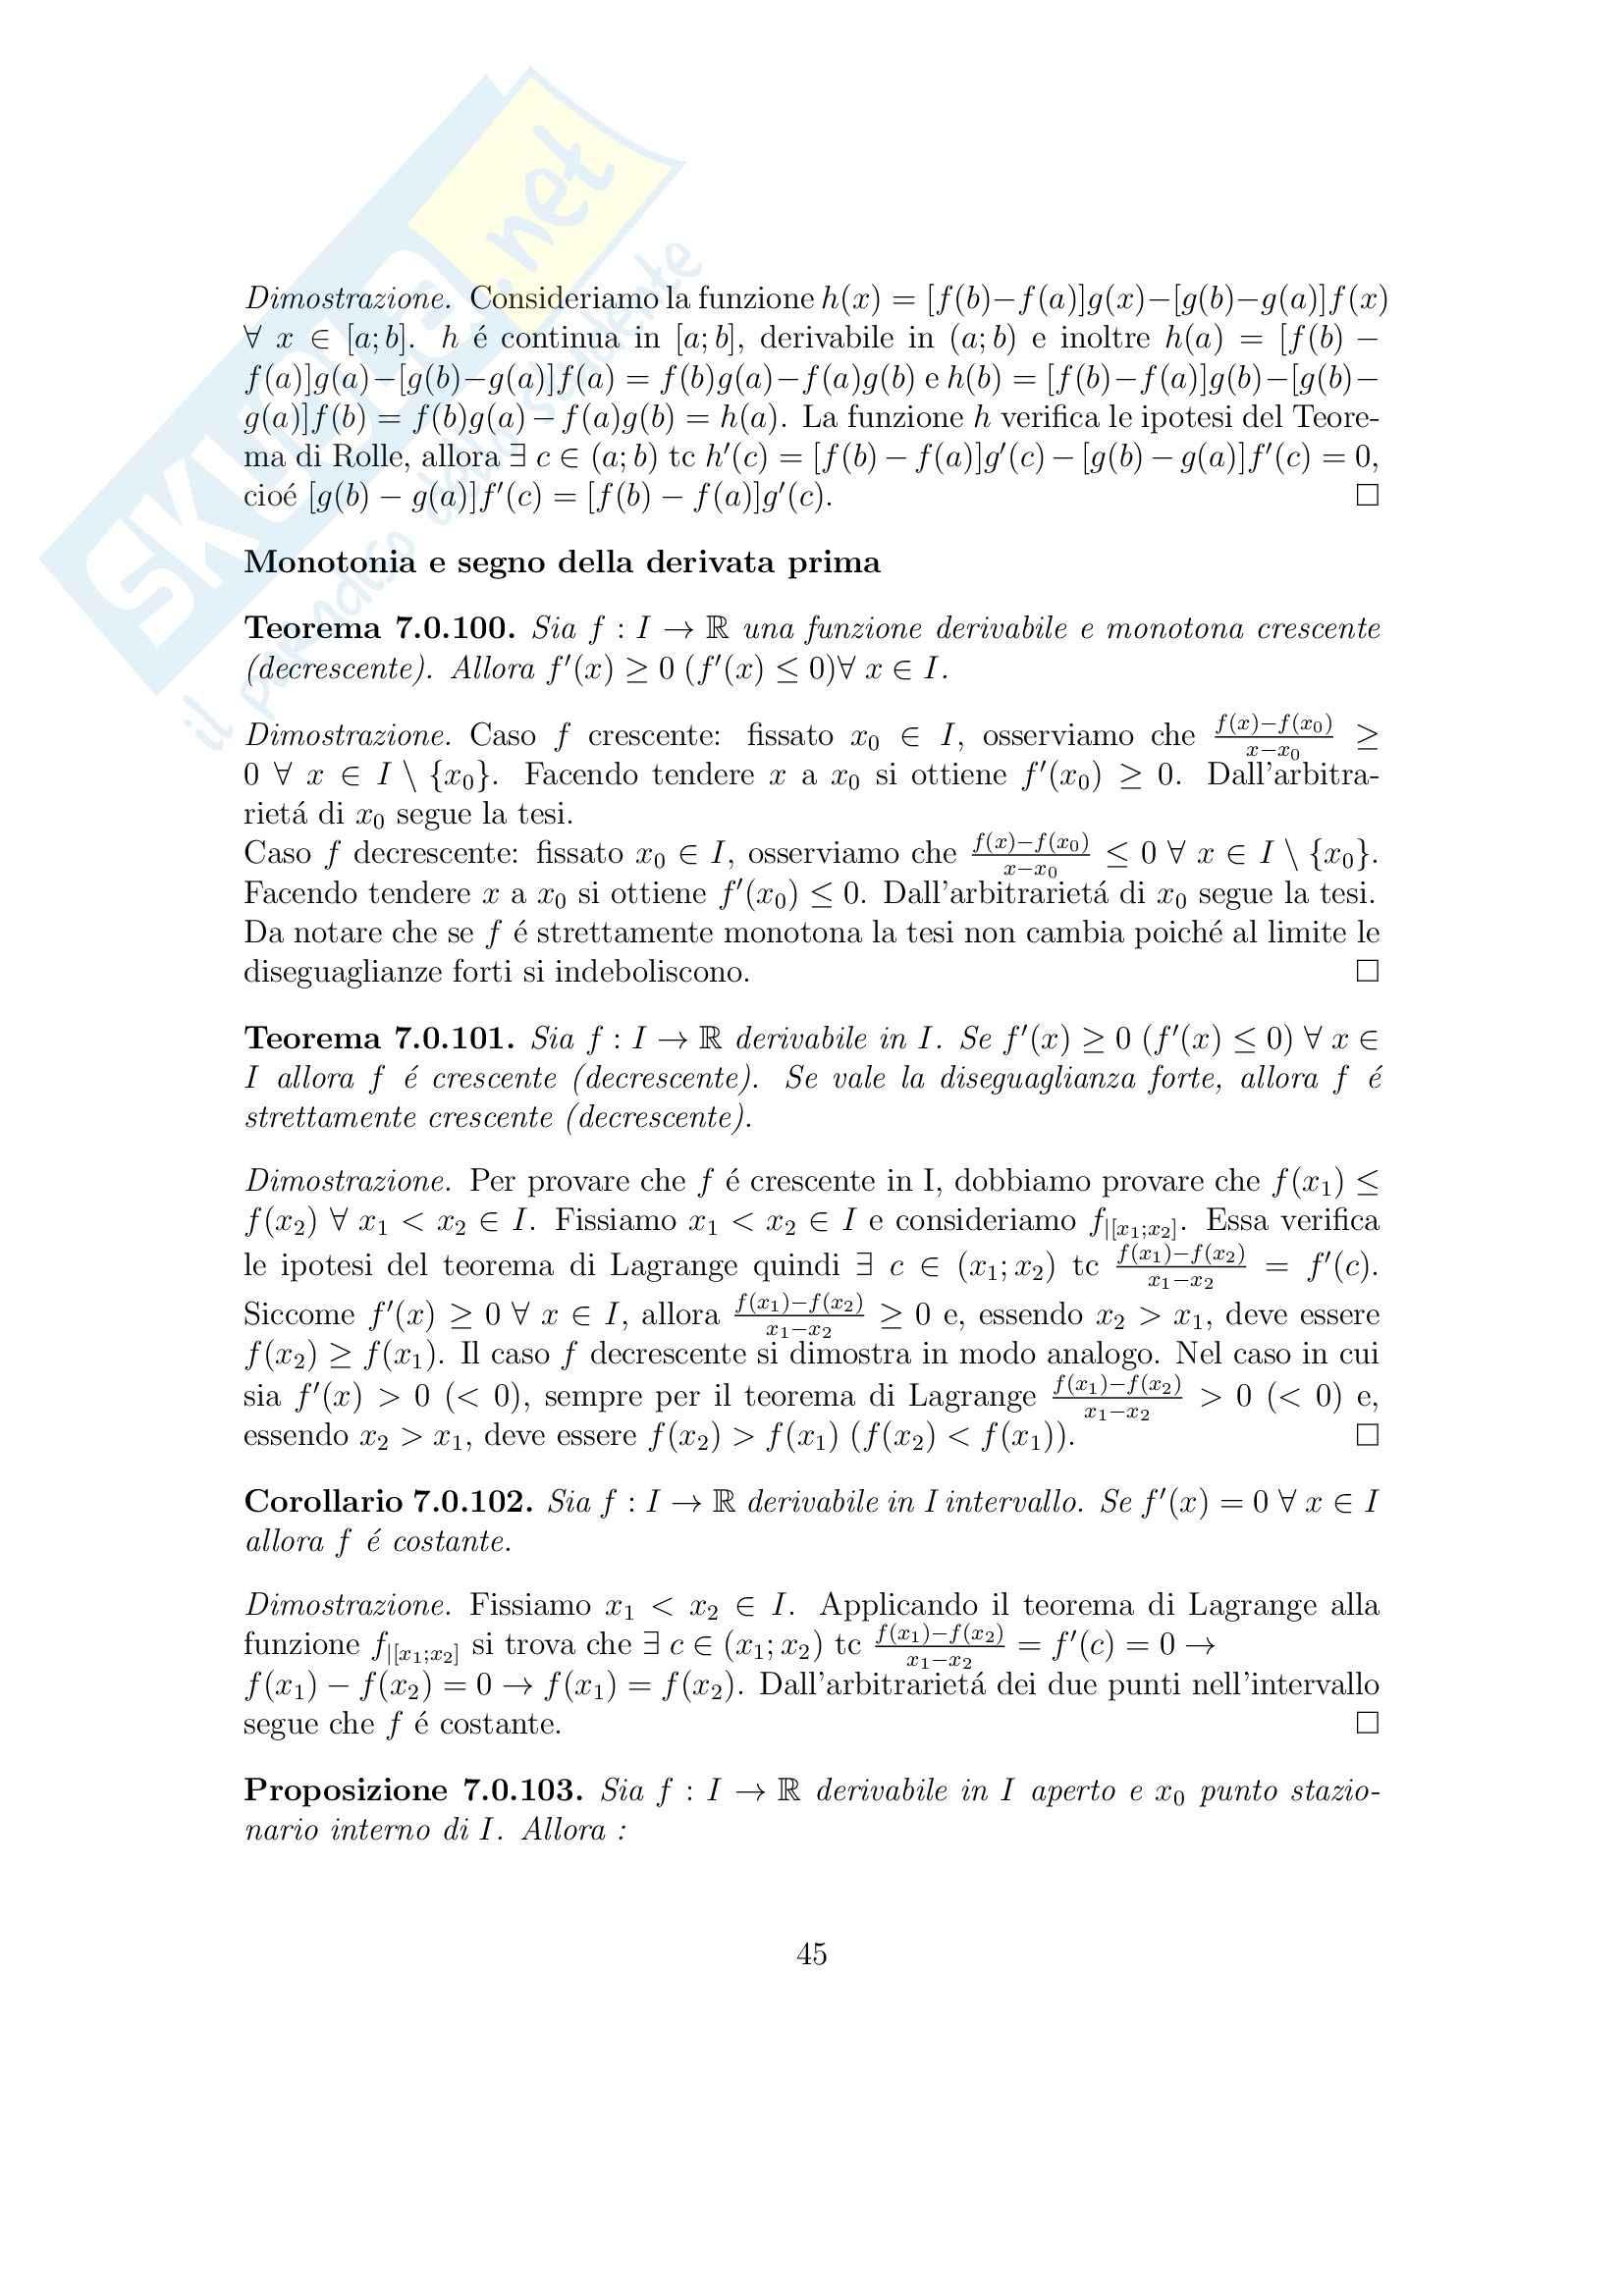 Analisi matematica 1 - Appunti Pag. 46